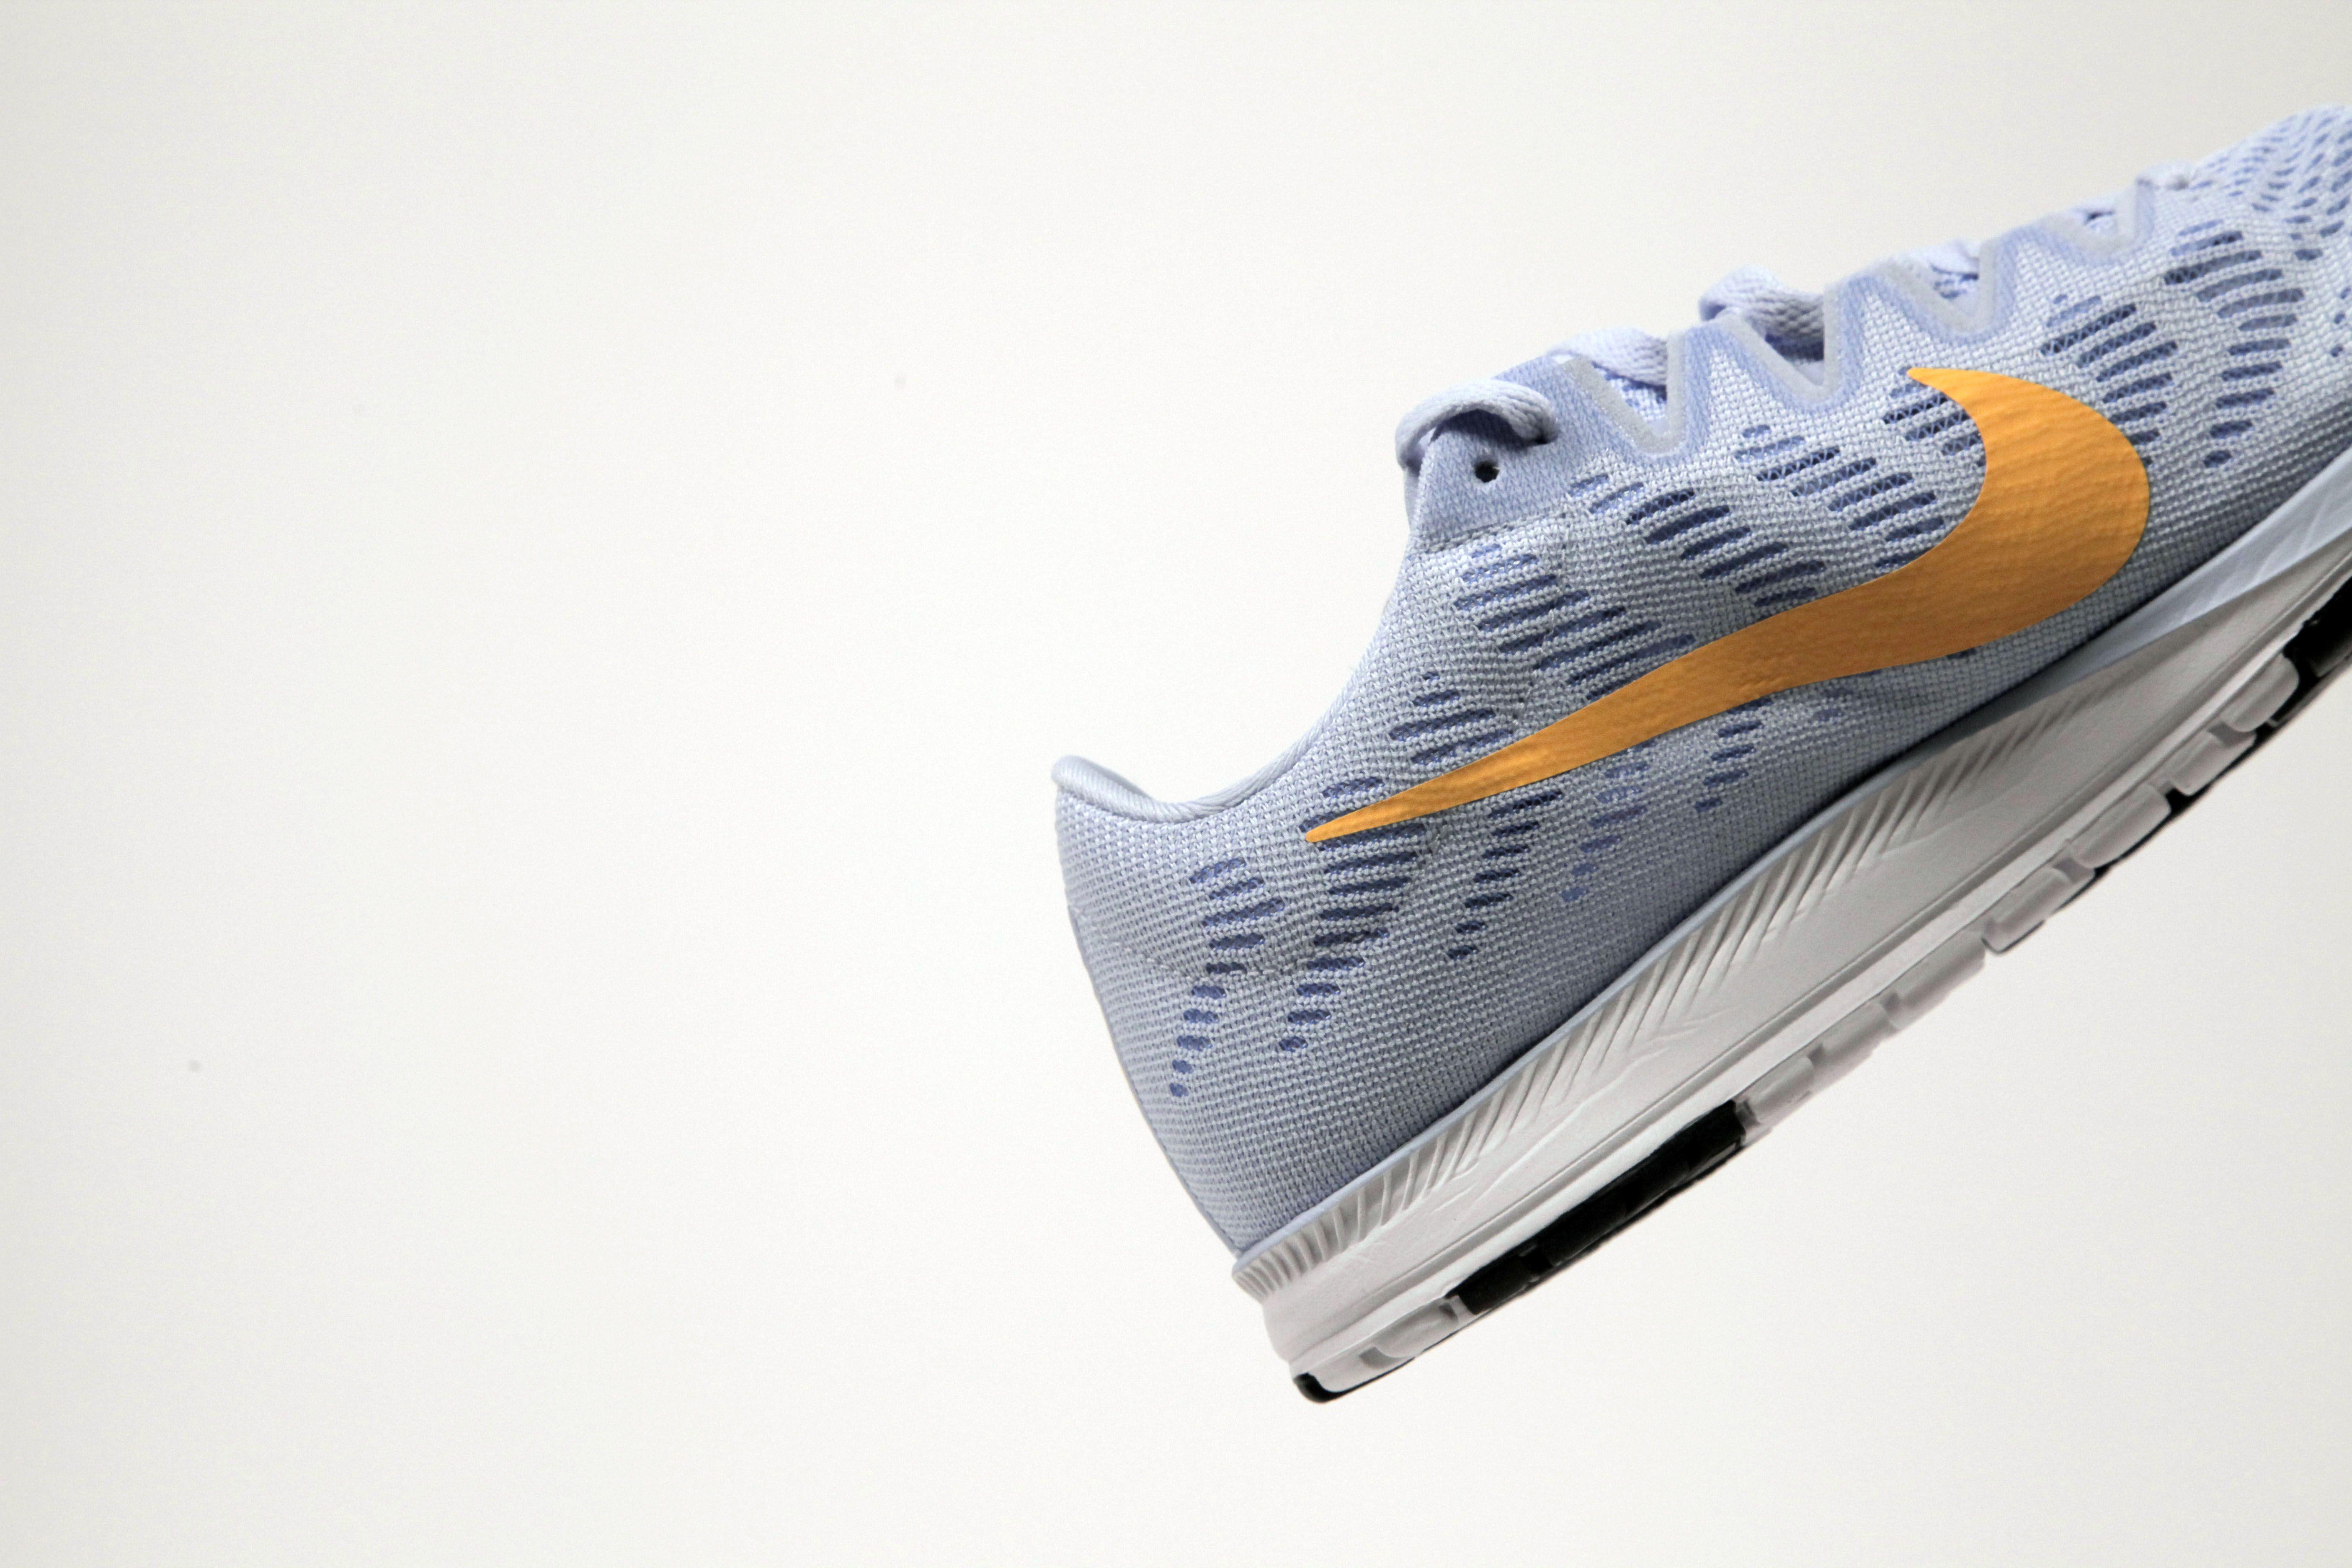 Nike Air Zoom Streak 7 review